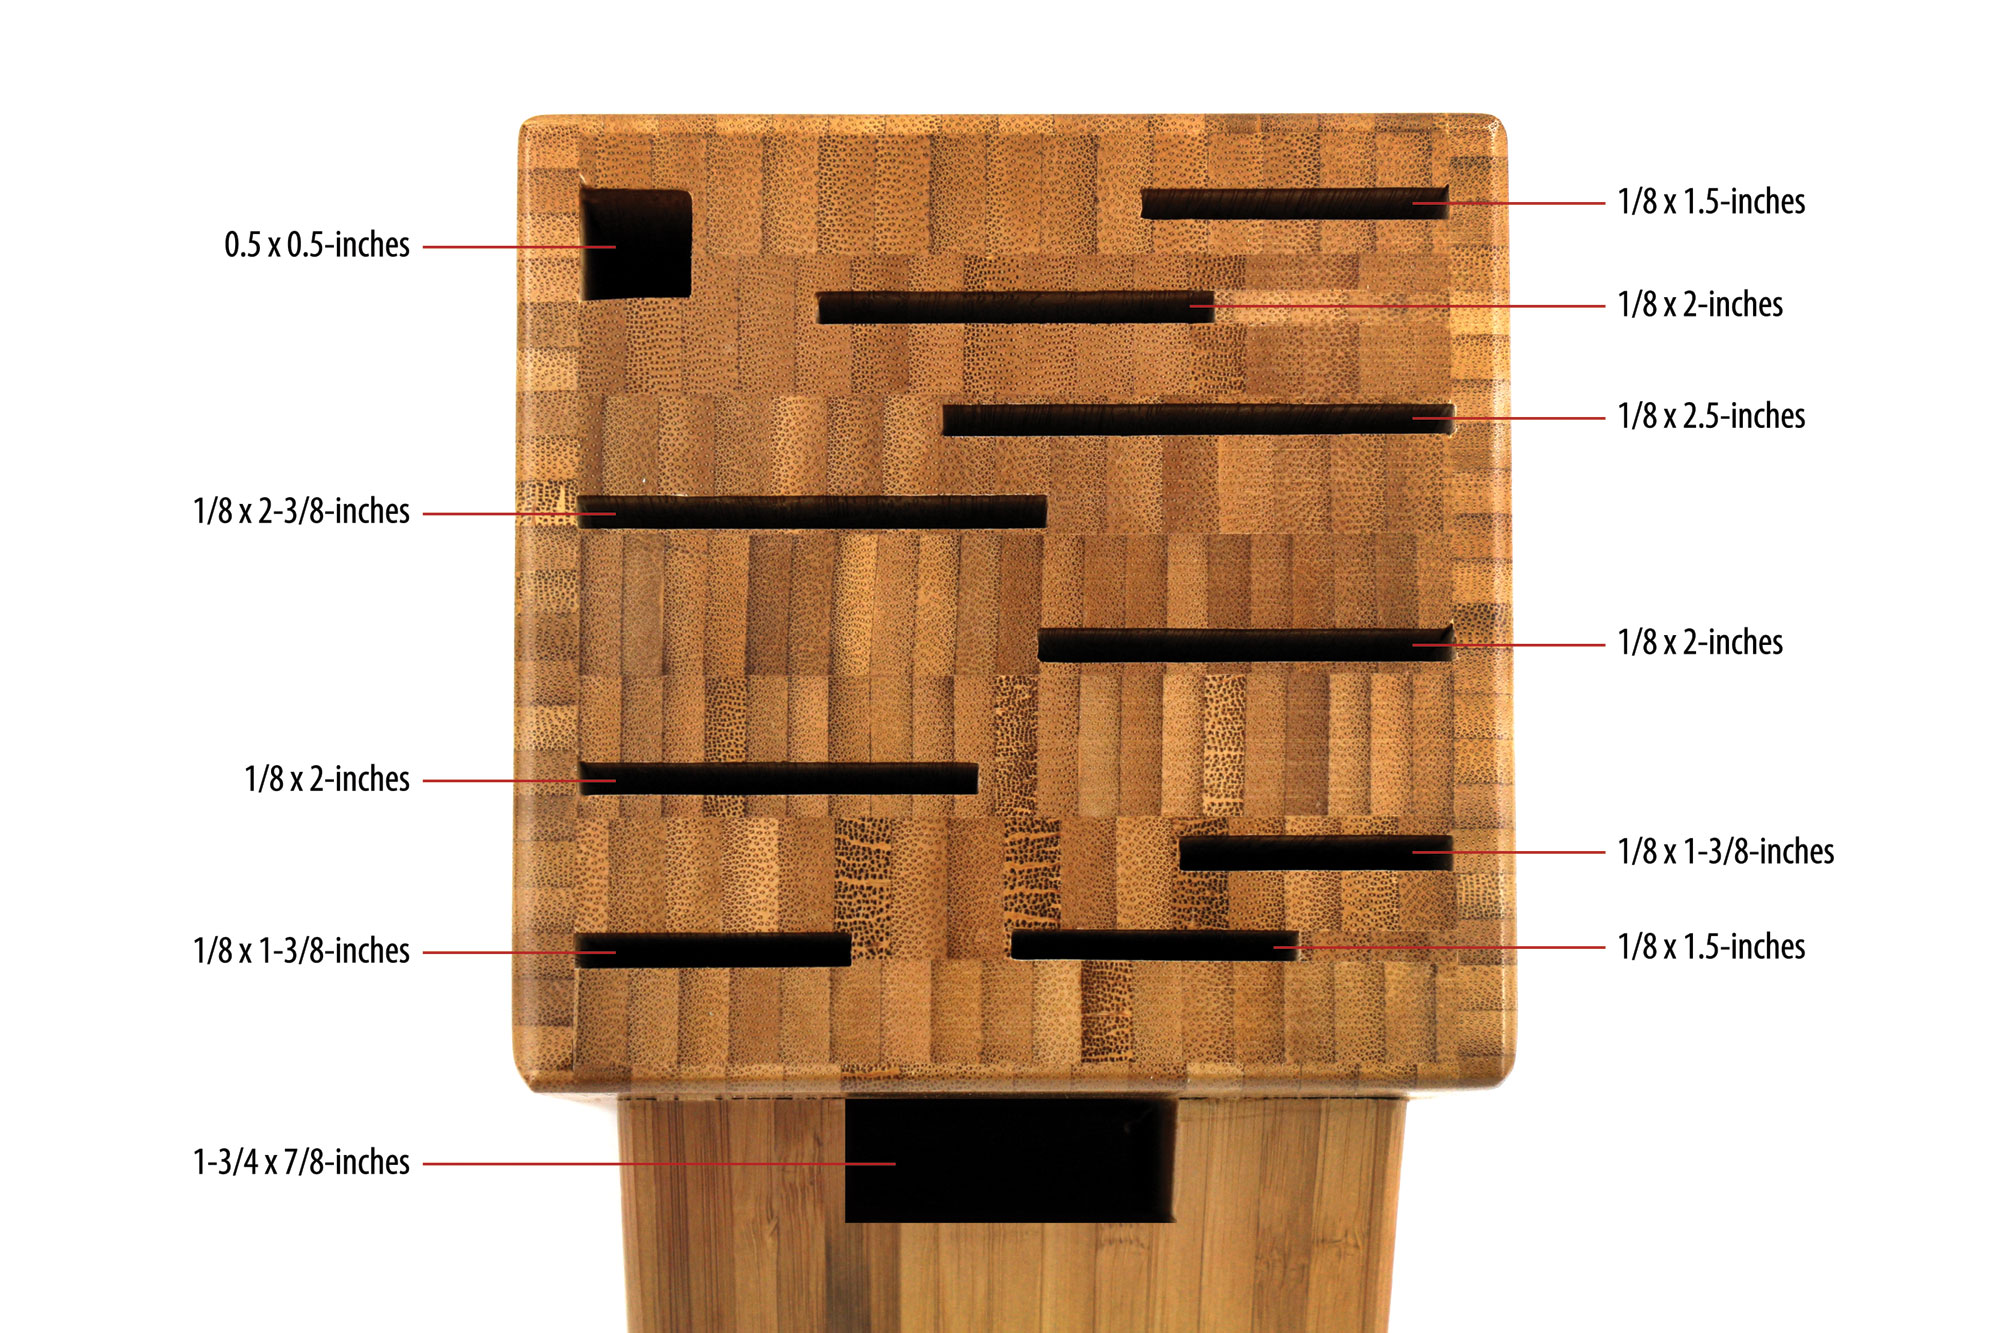 Shun Bamboo Knife Block 11 Slot Cutlery And More